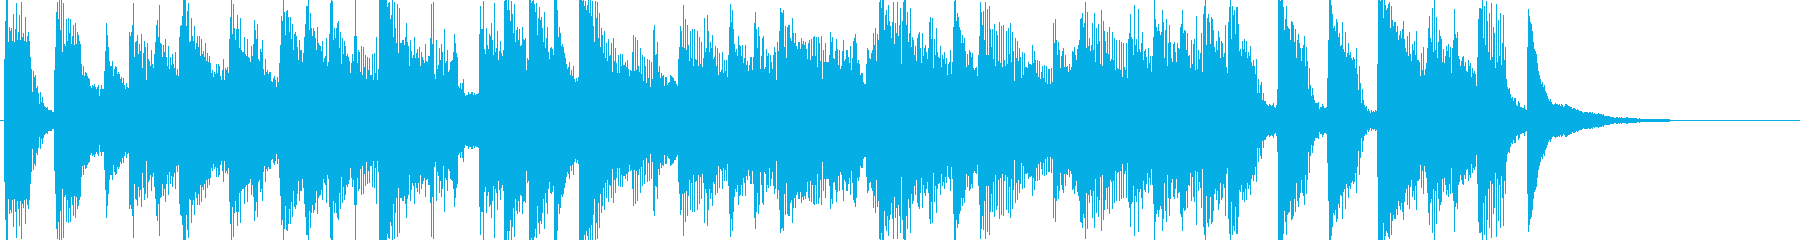 OP、ピアノ、アコギ、出囃子の再生済みの波形